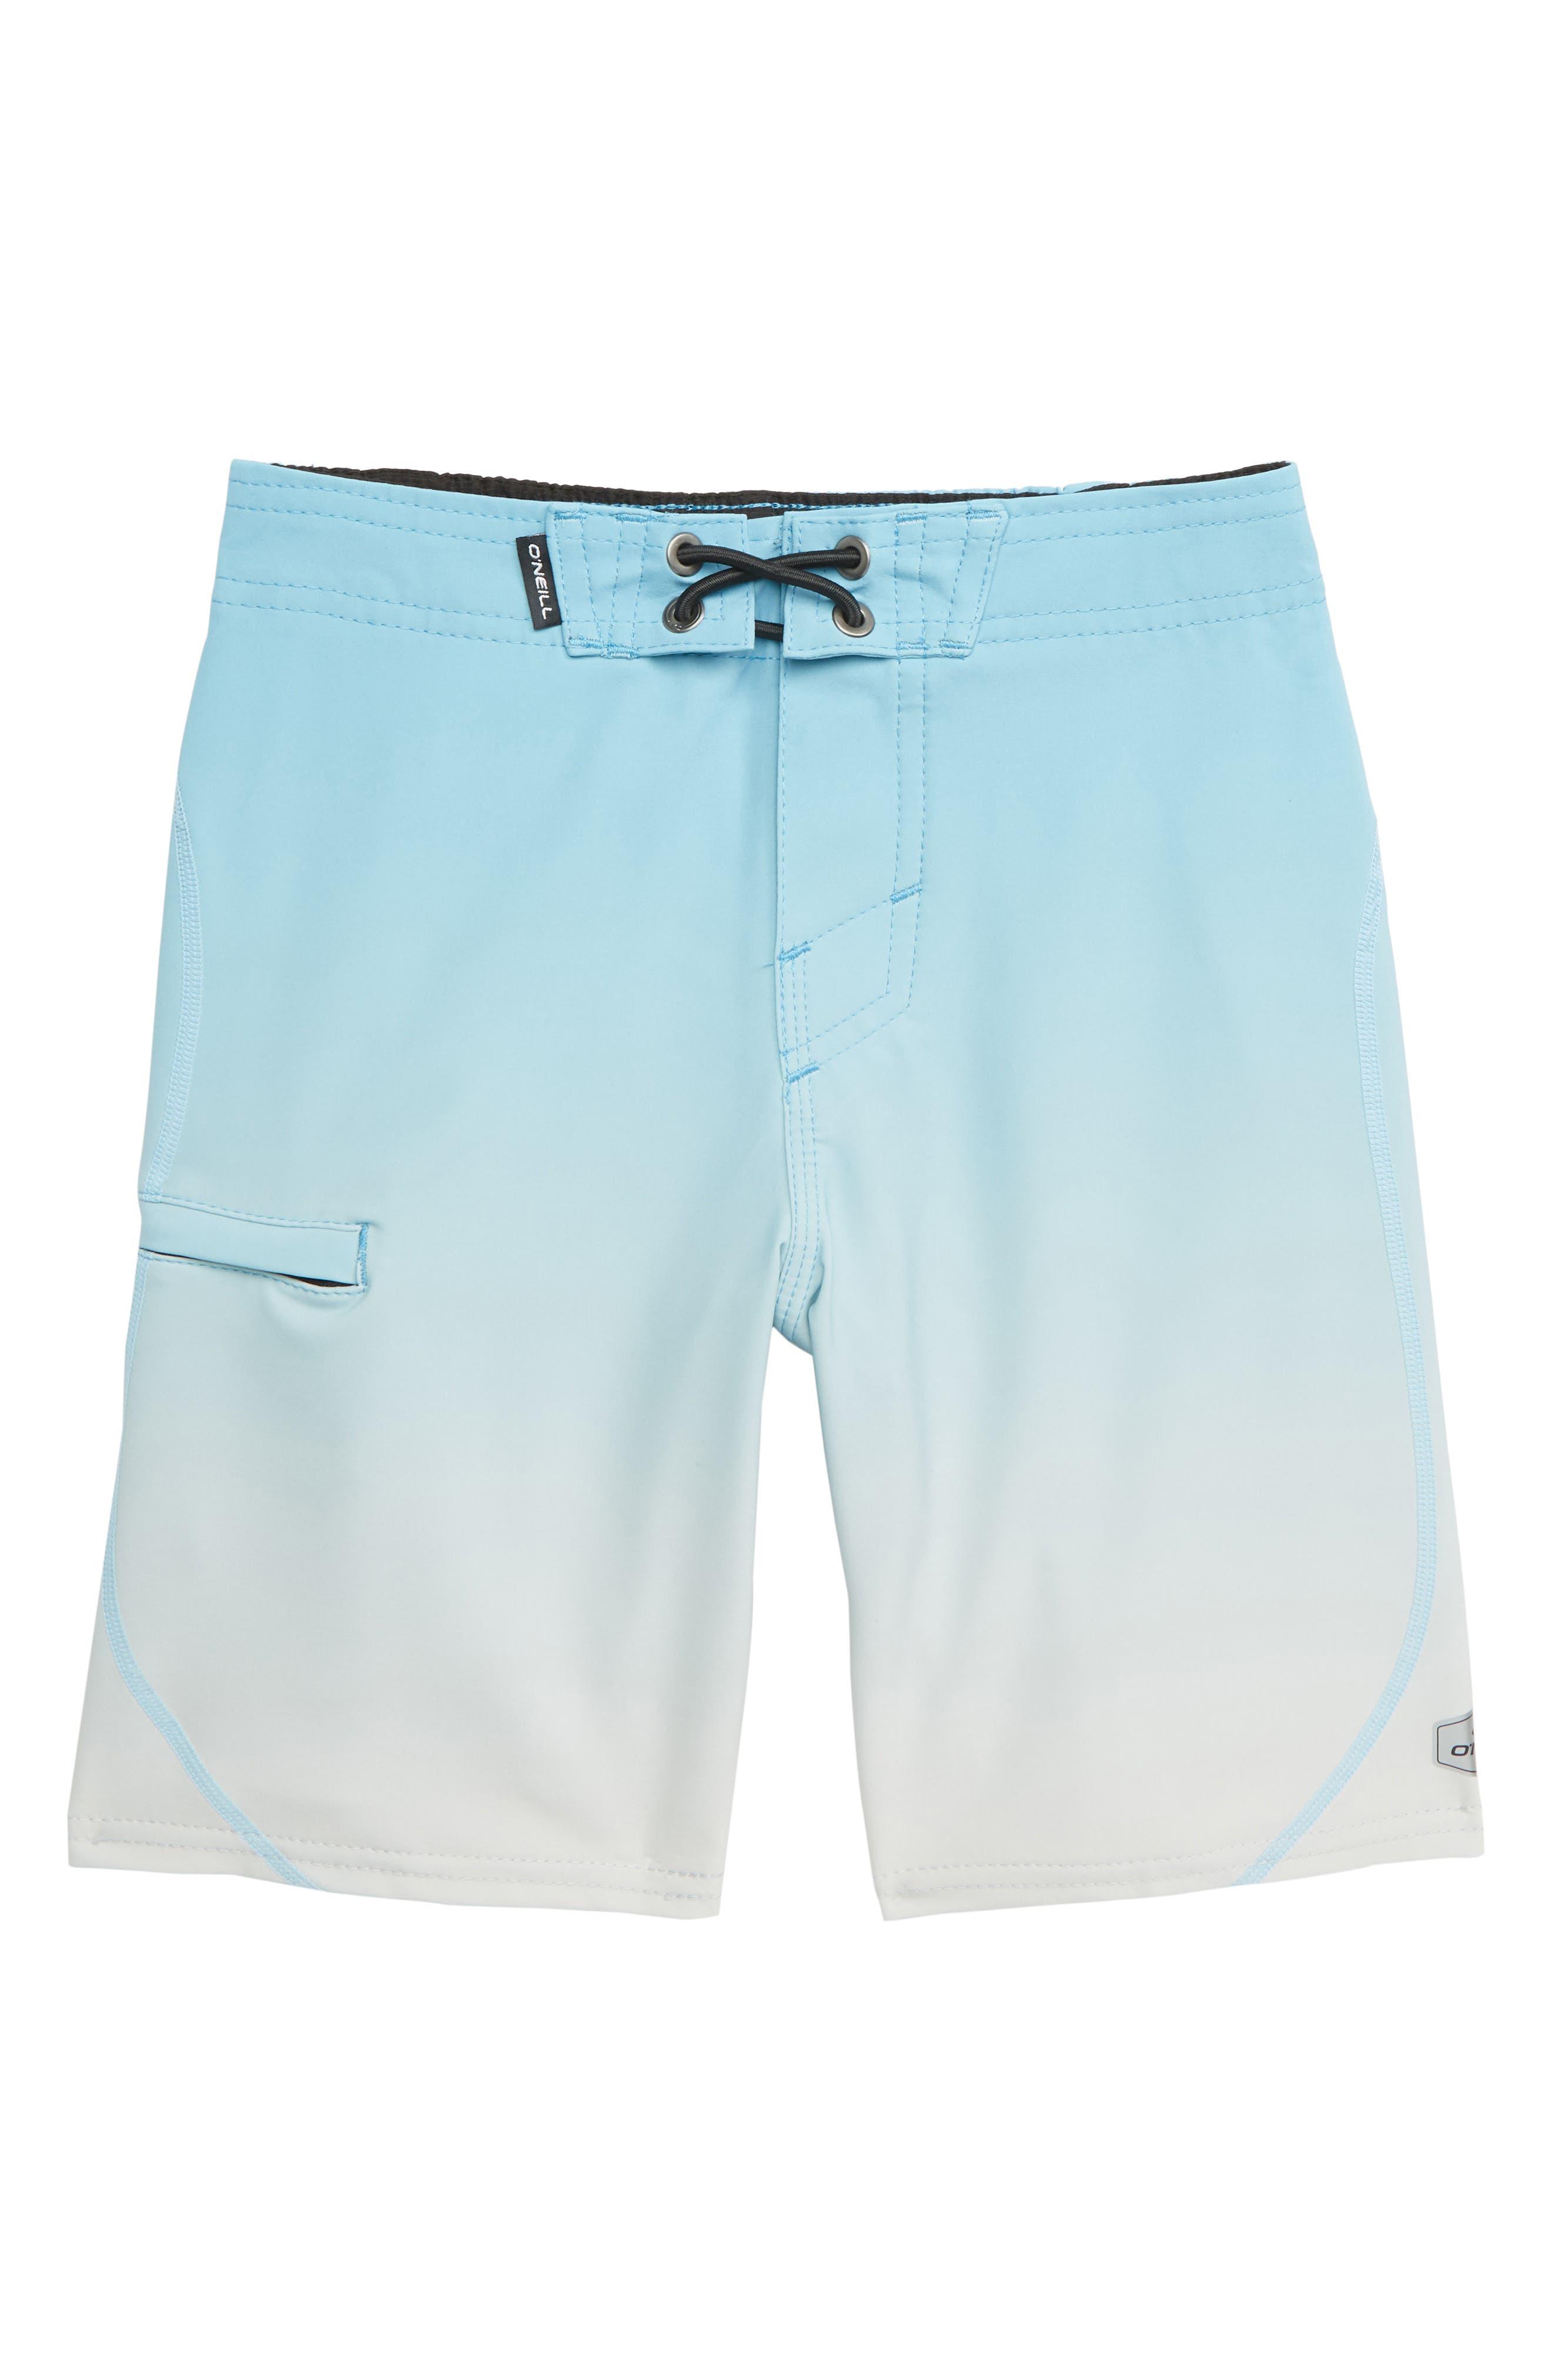 O'NEILL,                             Hyperfreak Board Shorts,                             Main thumbnail 1, color,                             CYAN